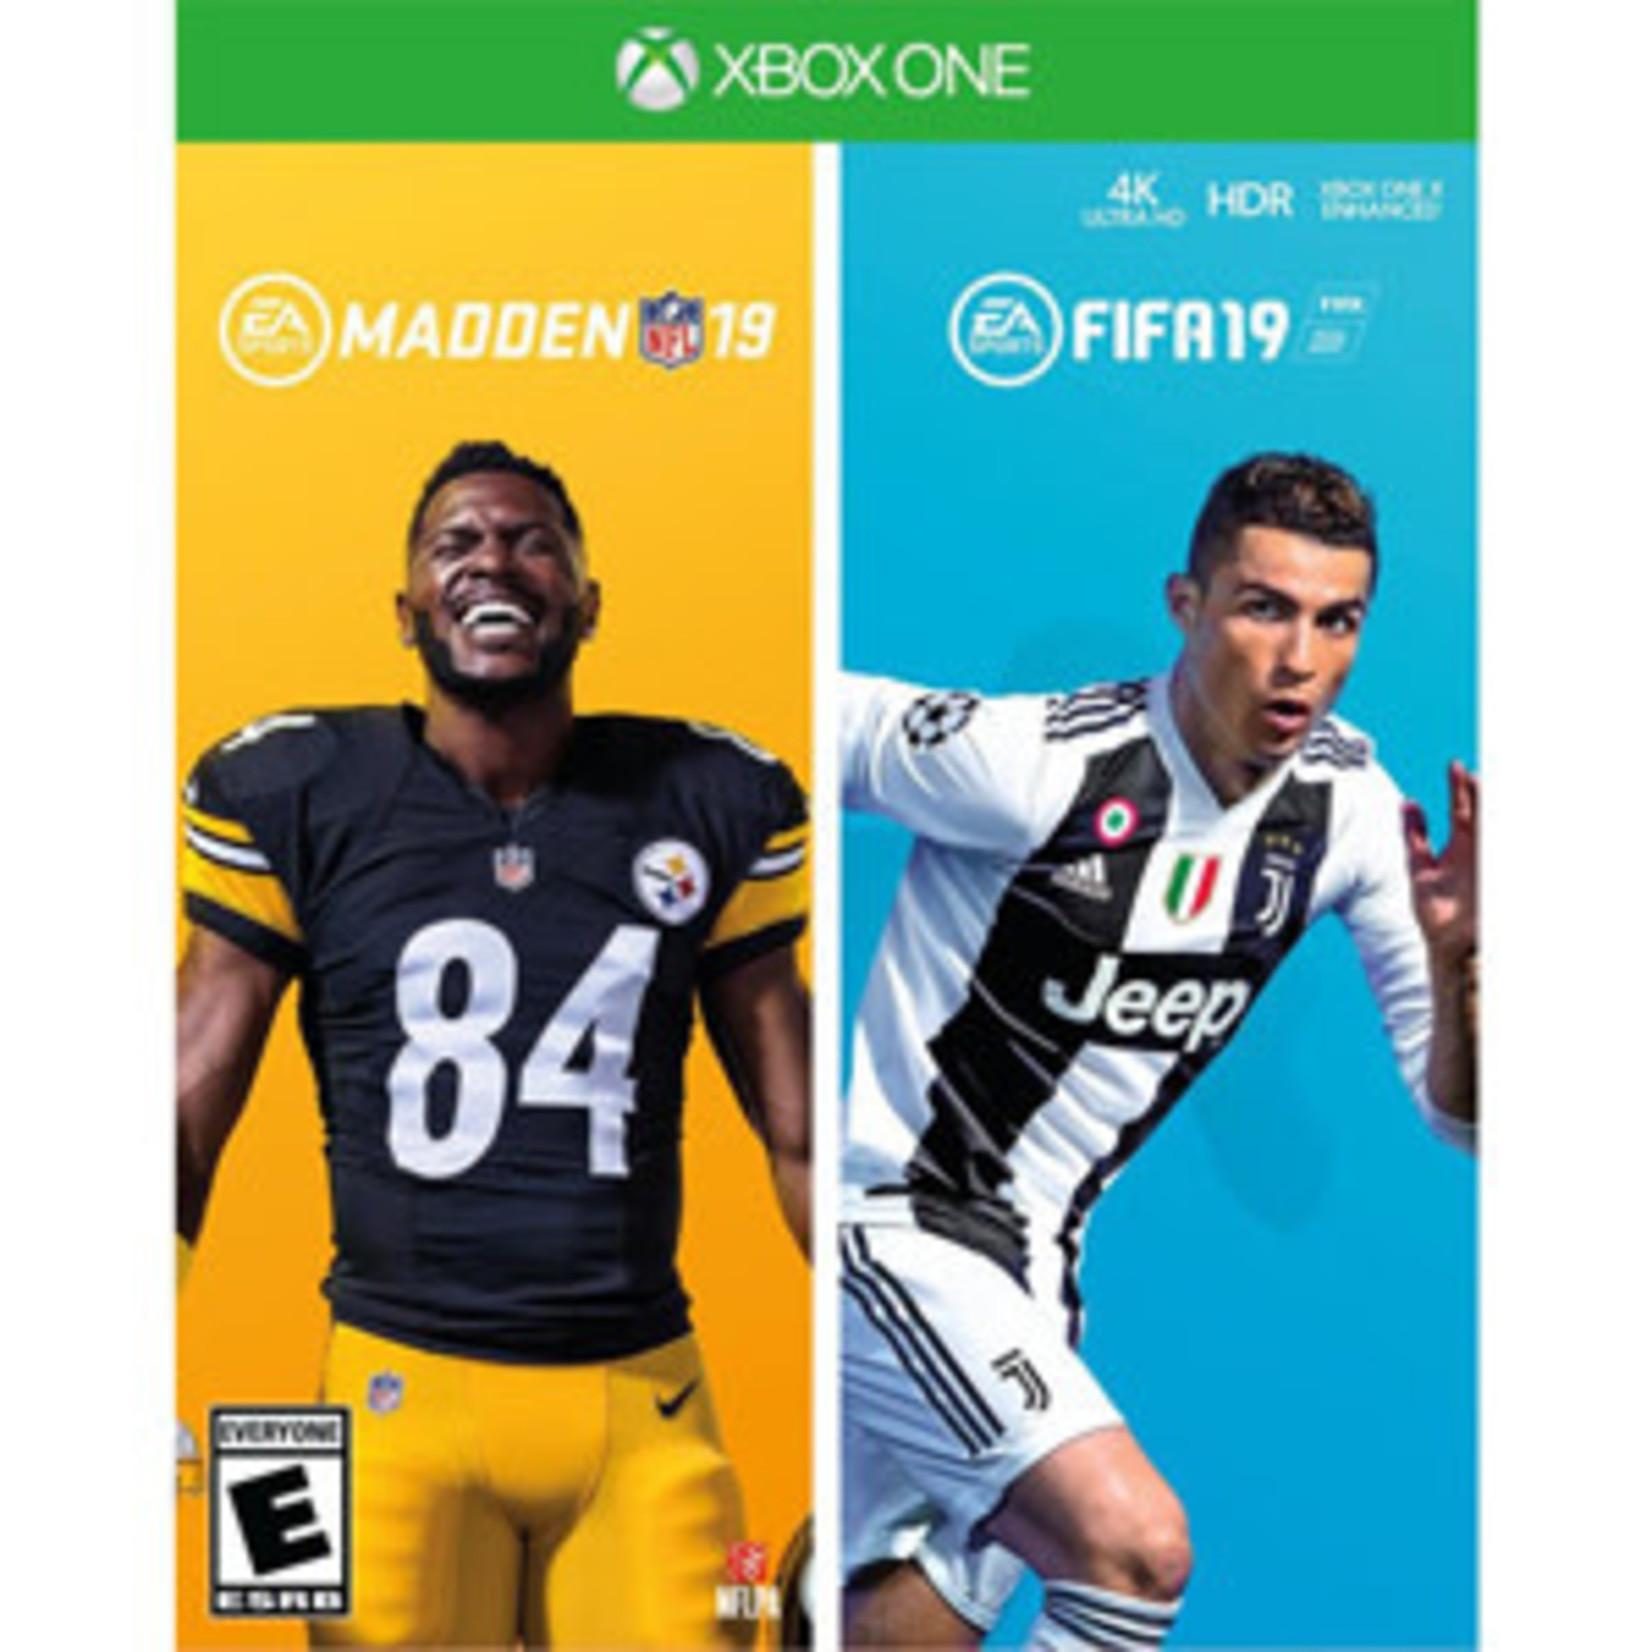 XB1-Madden NFL 19 and FIFA 19 Bundle